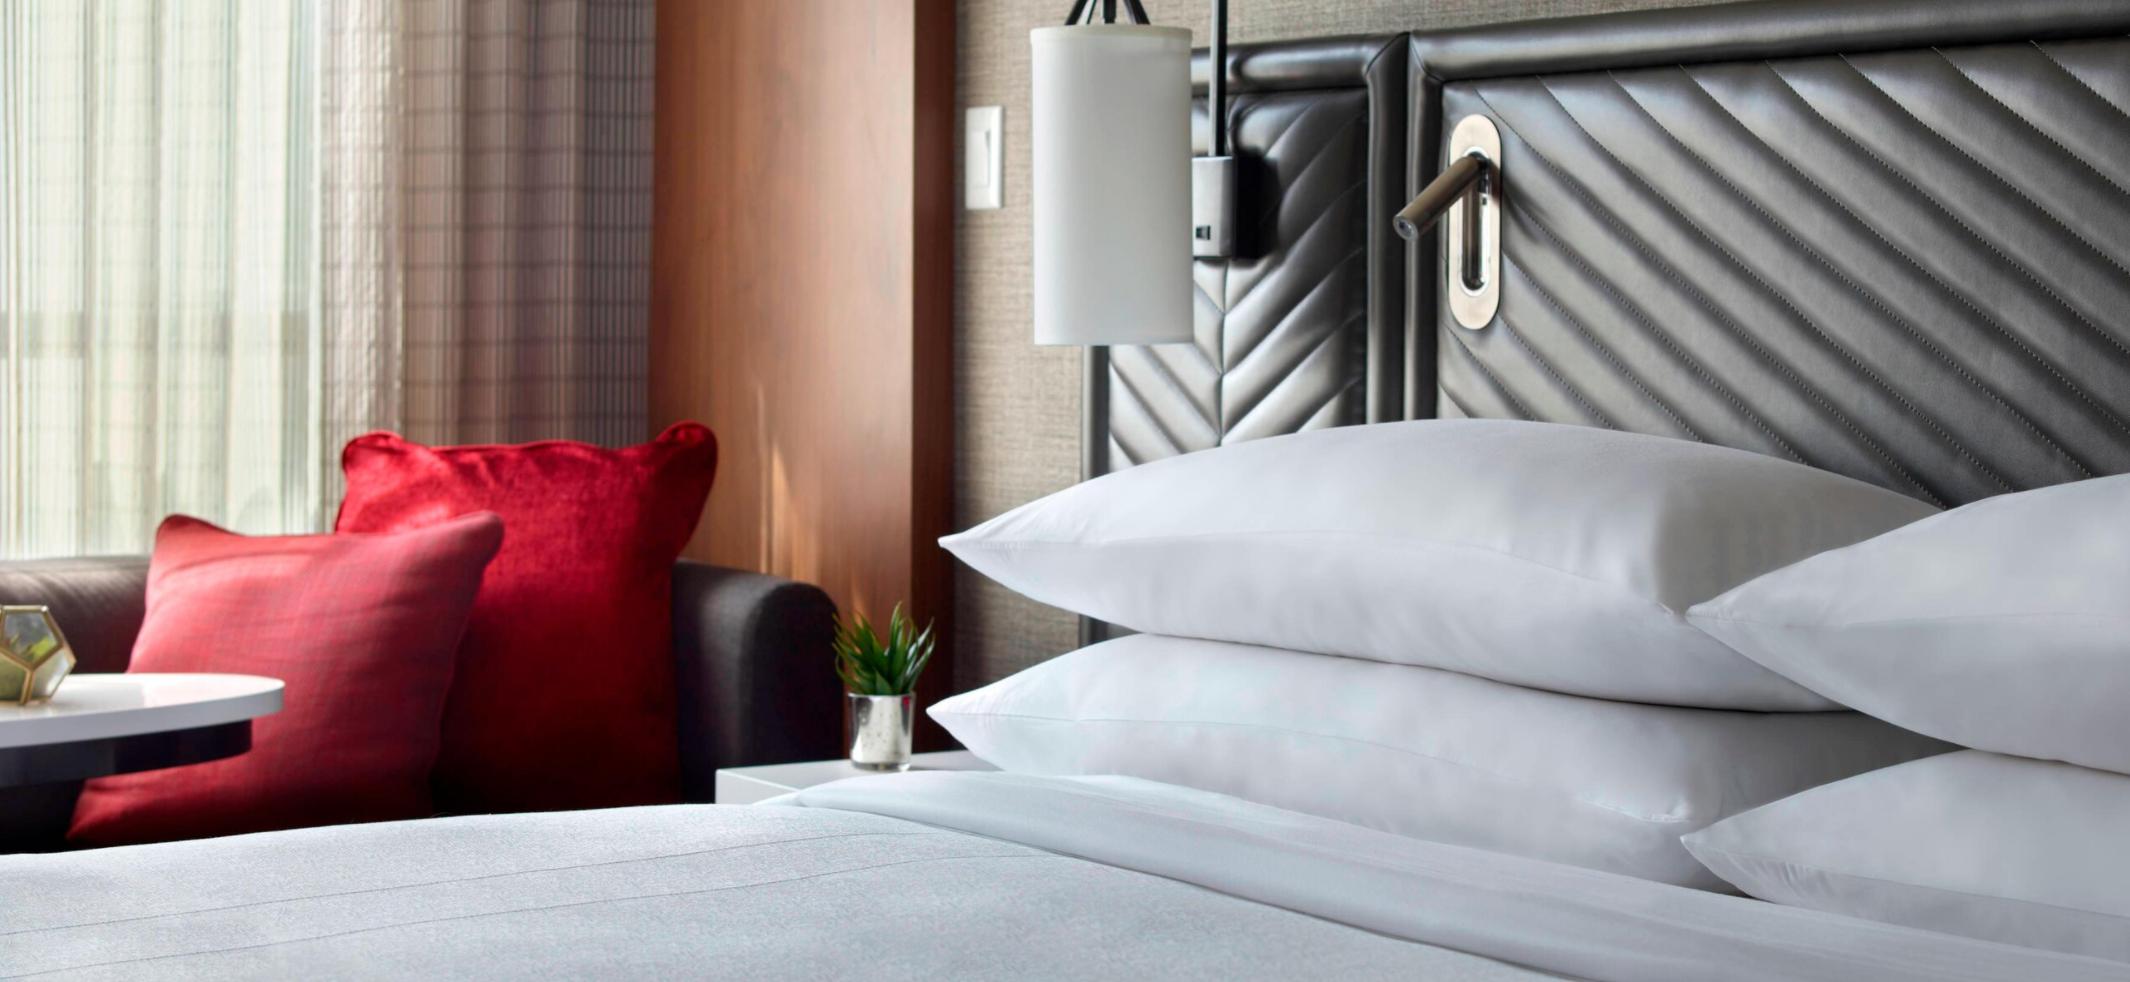 https://www.hotelsbyday.com/_data/default-hotel_image/3/18508/screenshot-2020-06-12-at-5-10-36-pm.png